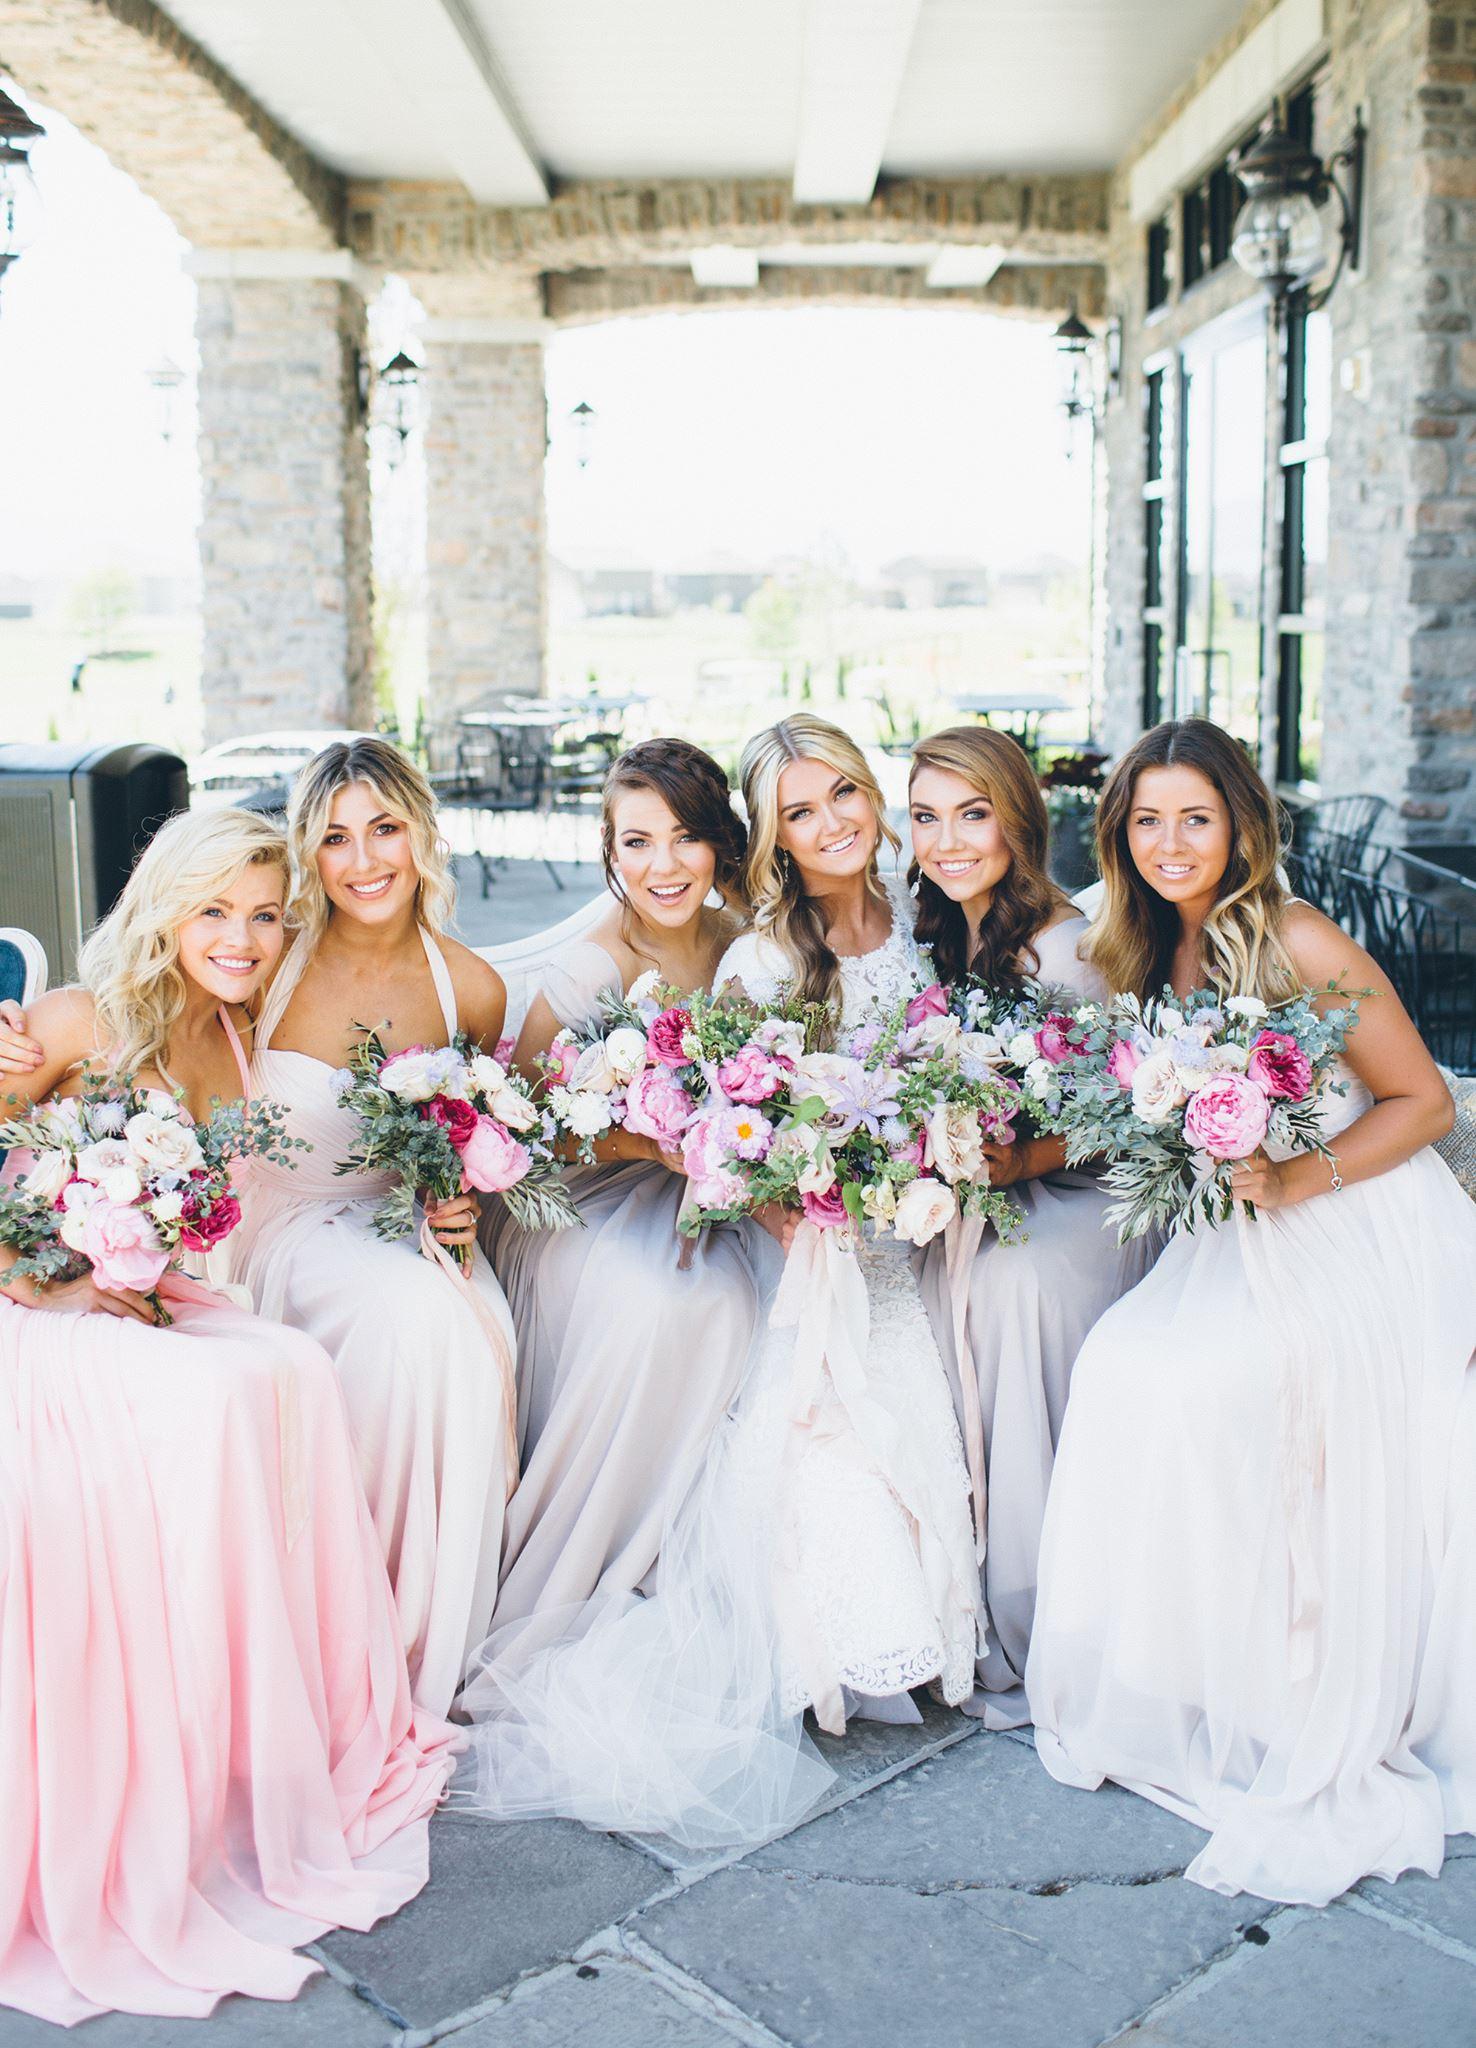 Dancing Through Life: A Wedding at Sleepy Ridge